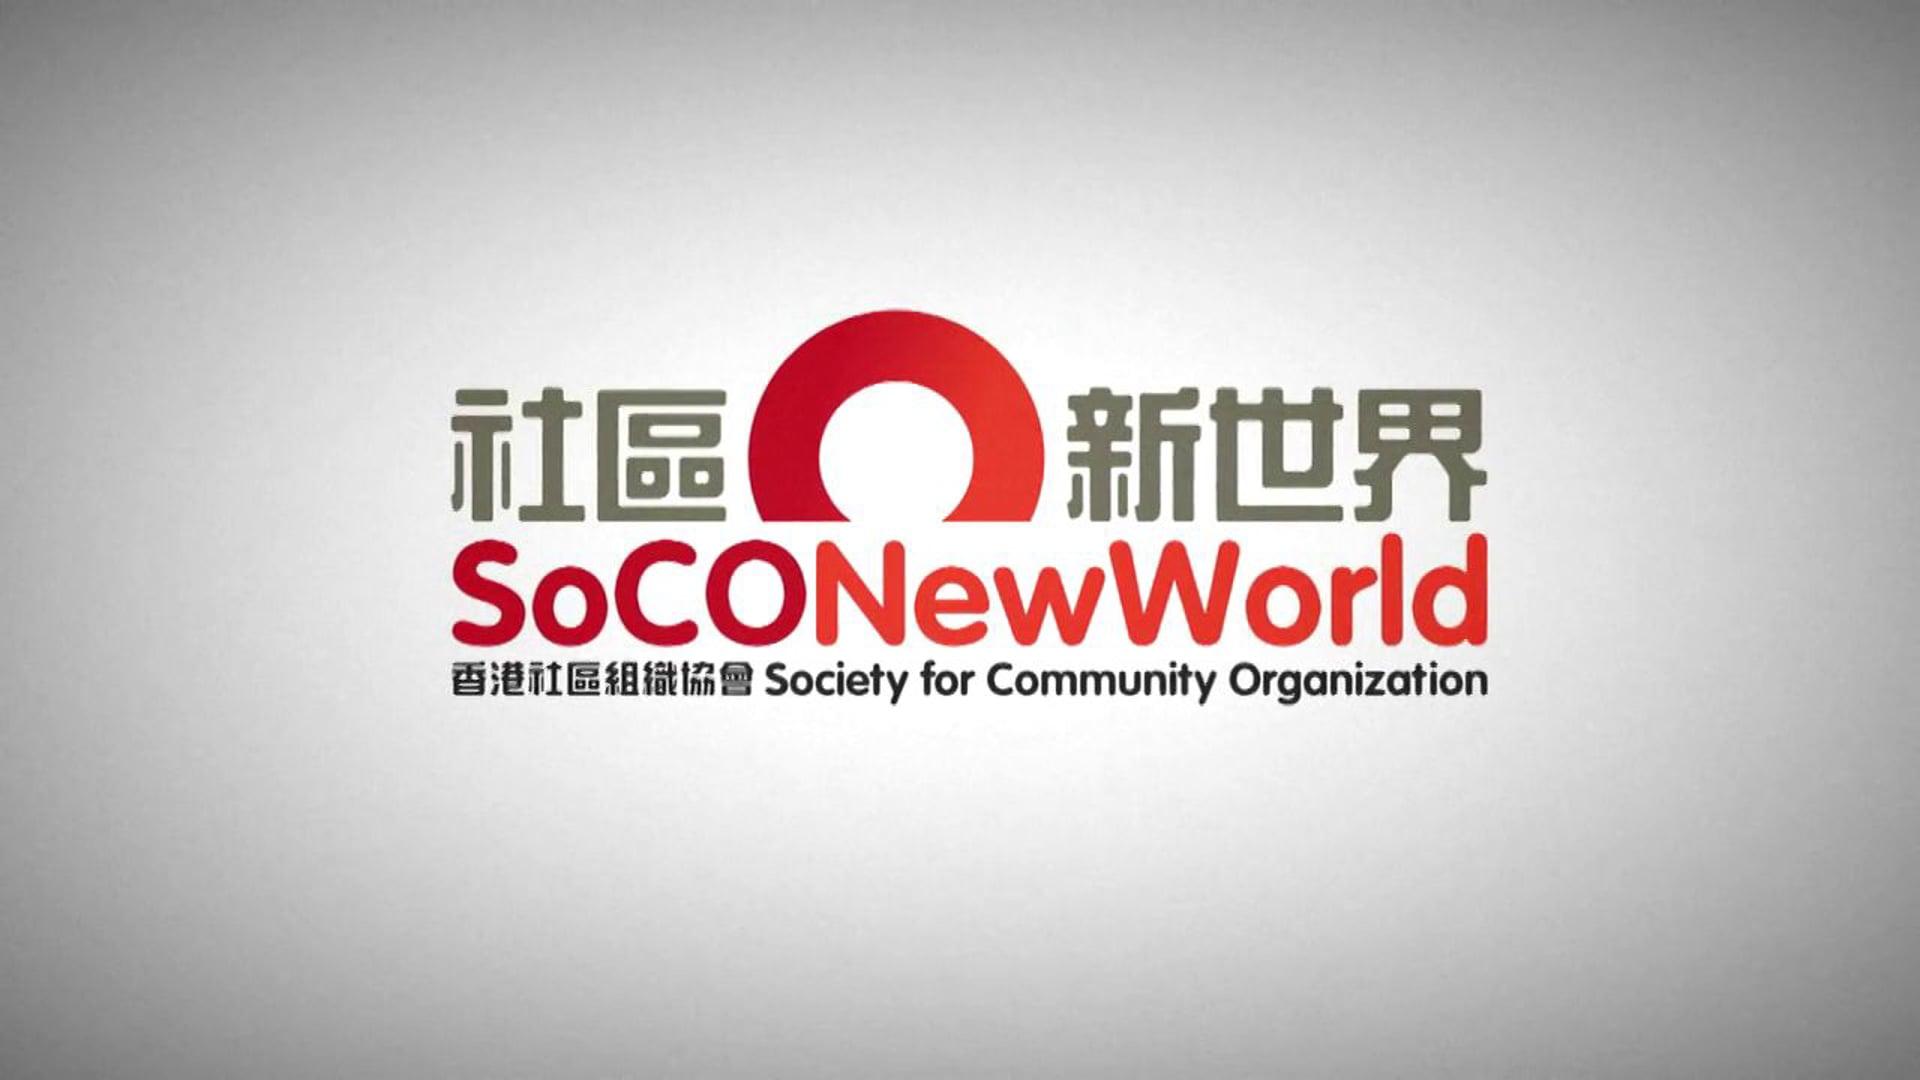 SoCo New world 2mins version 4